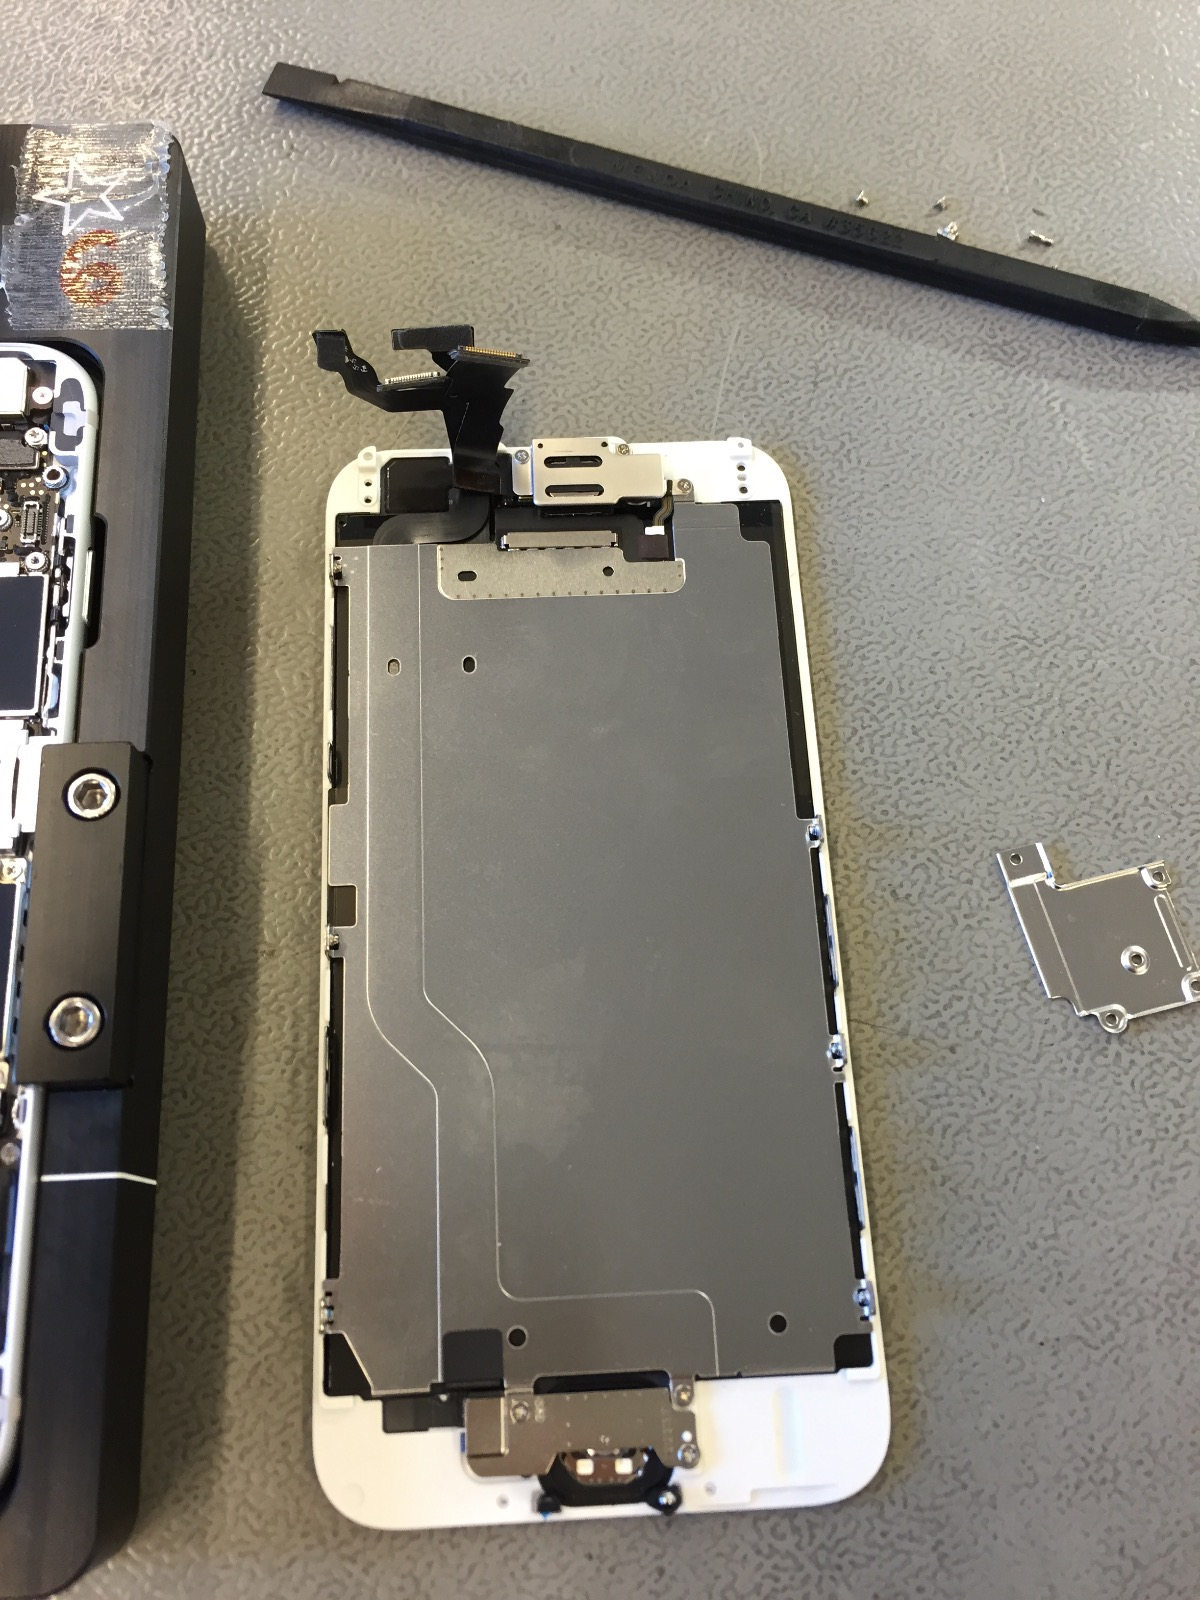 Smartphone Reparatur Rechte - gute Werkstatt finden